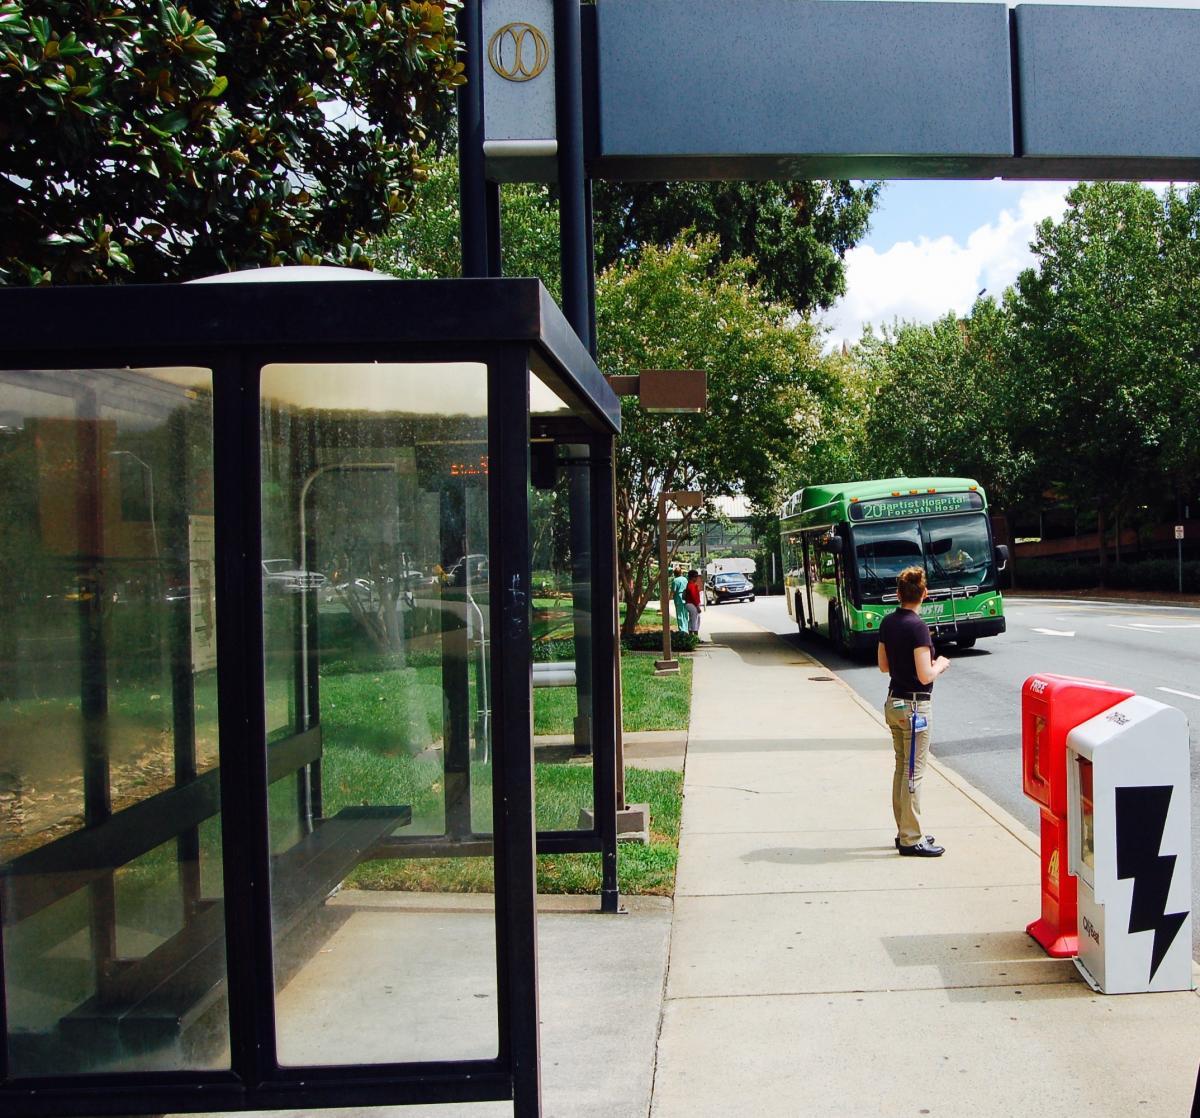 Home Organization Winston Salem: Changing The Way We Wait At Winston-Salem's Bus Stops